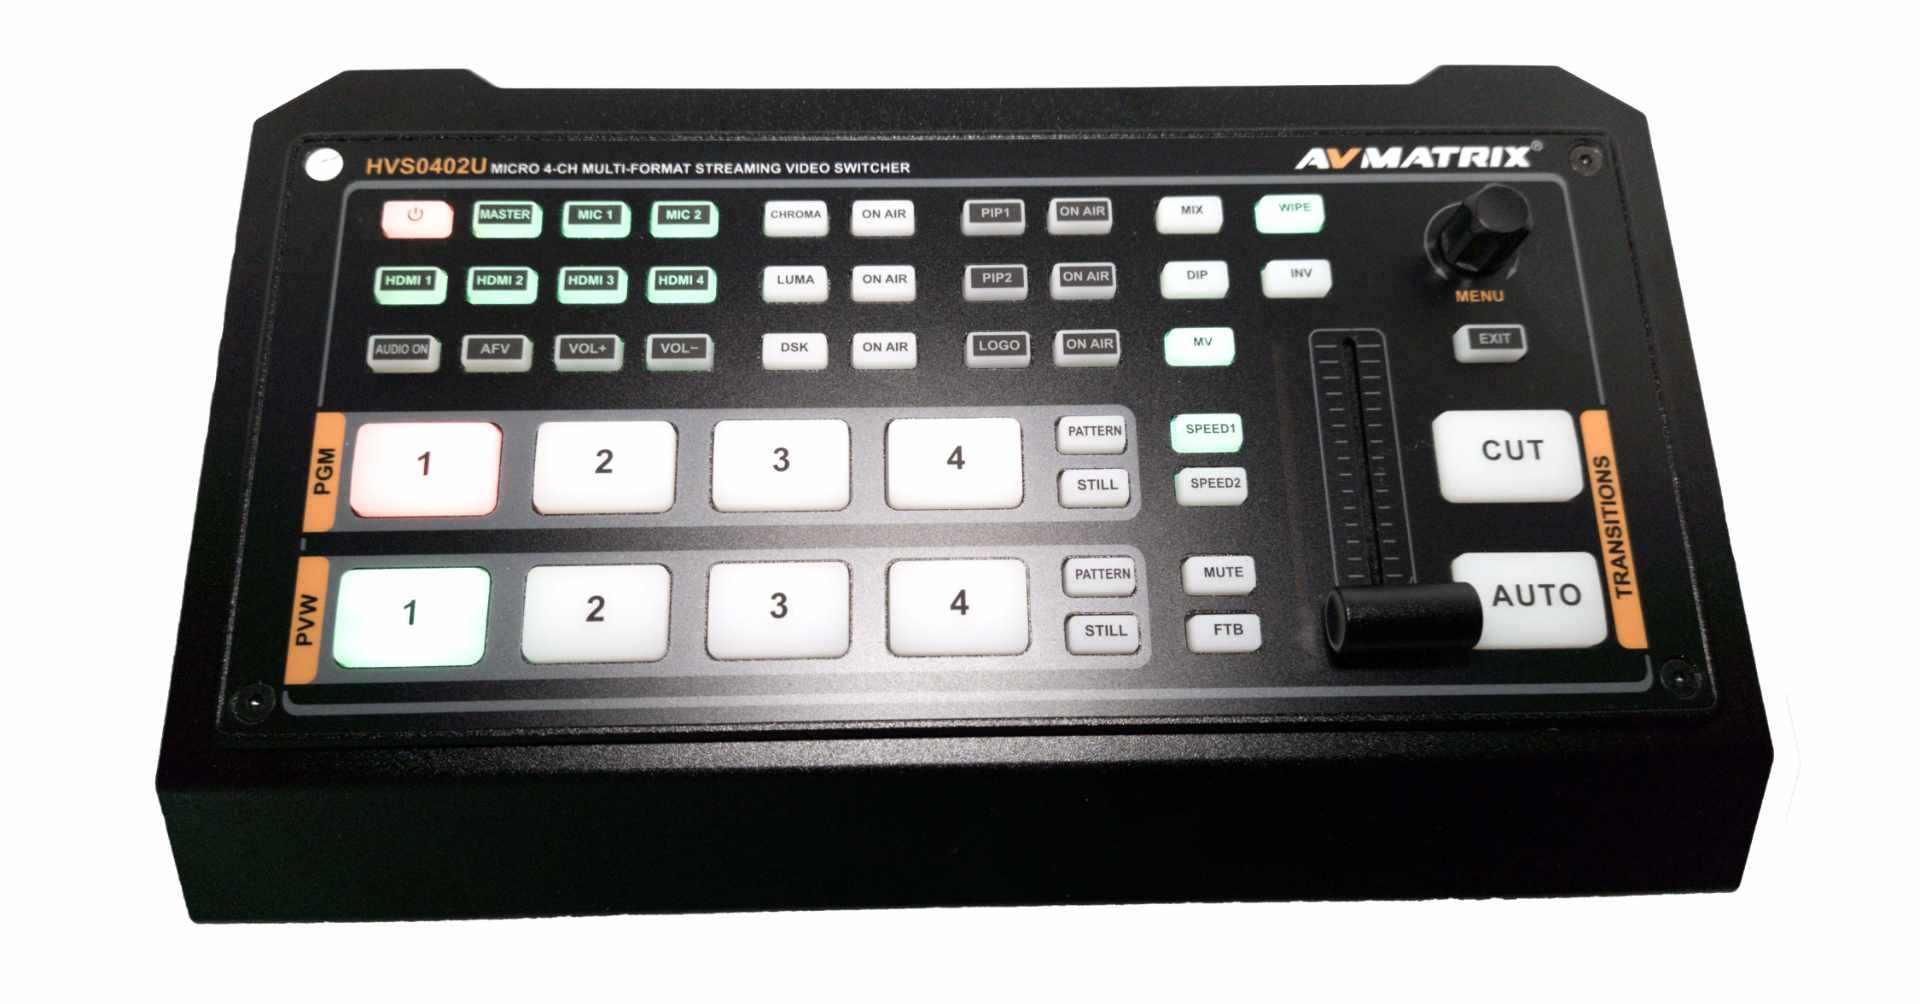 Artikelfoto AVMATRIX 4-Kanal Streaming Videomischer HVS0402U